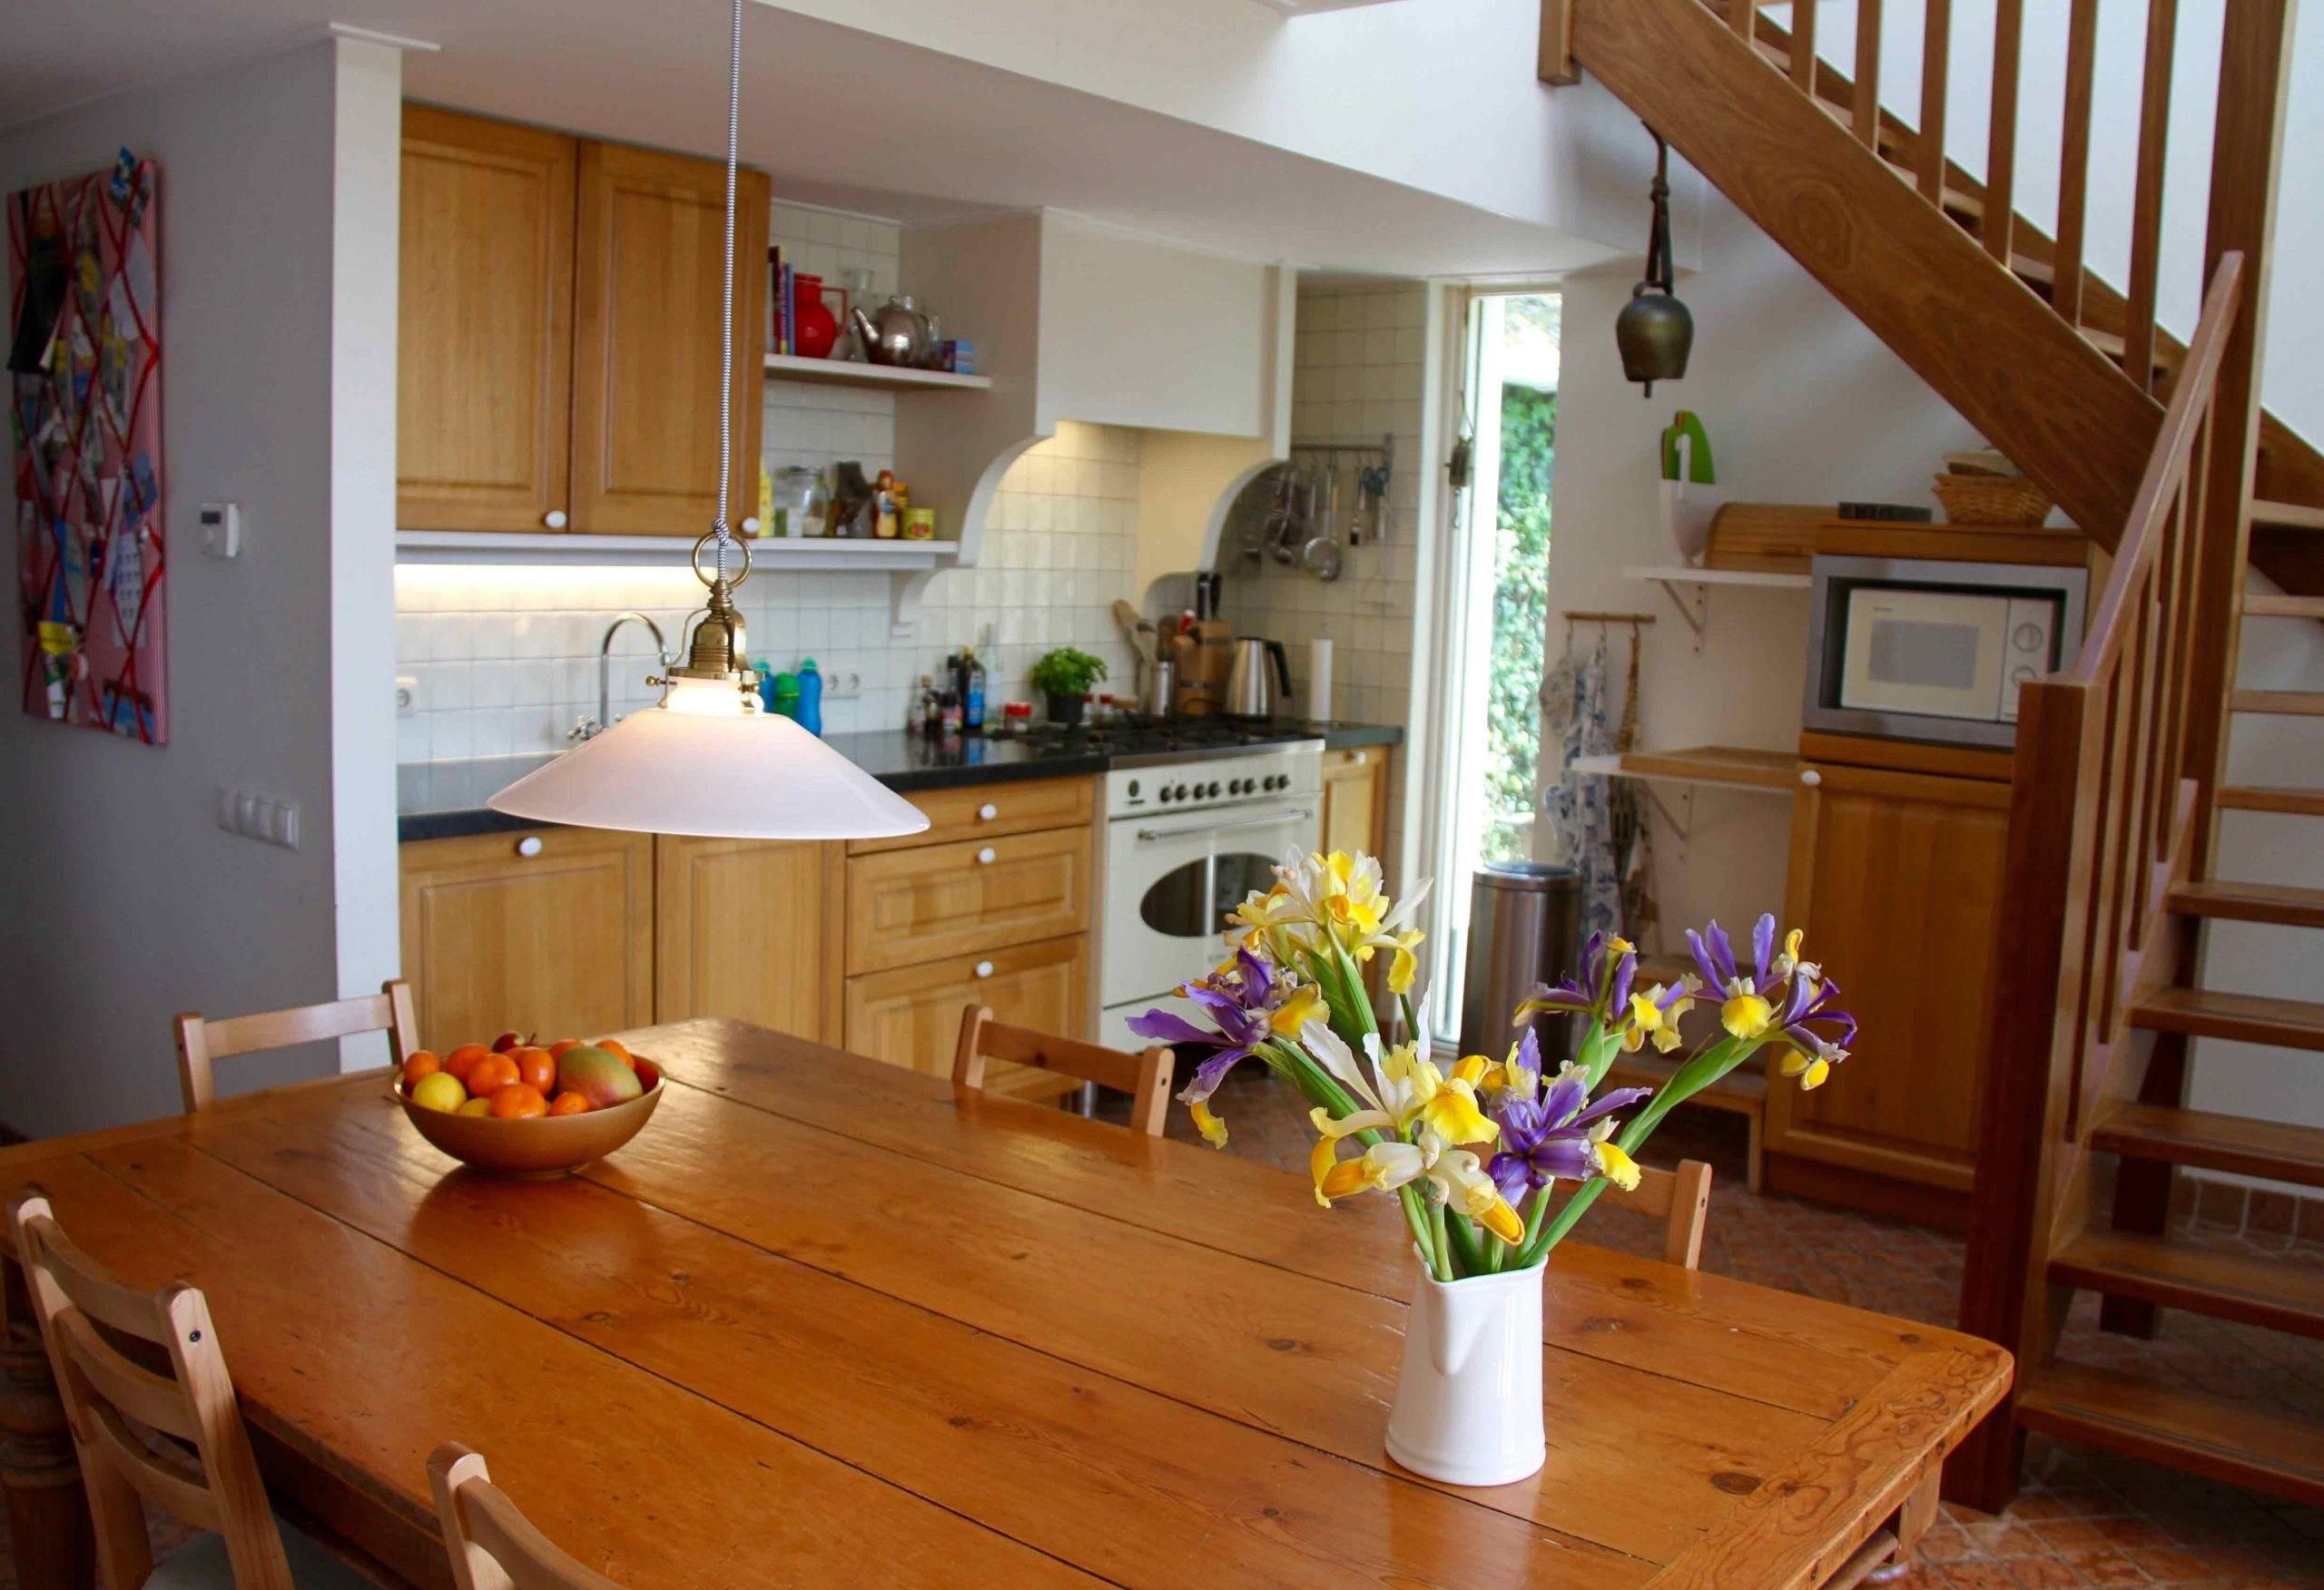 Blie_vakantiehuis-zeeland_nummer-10_keuken